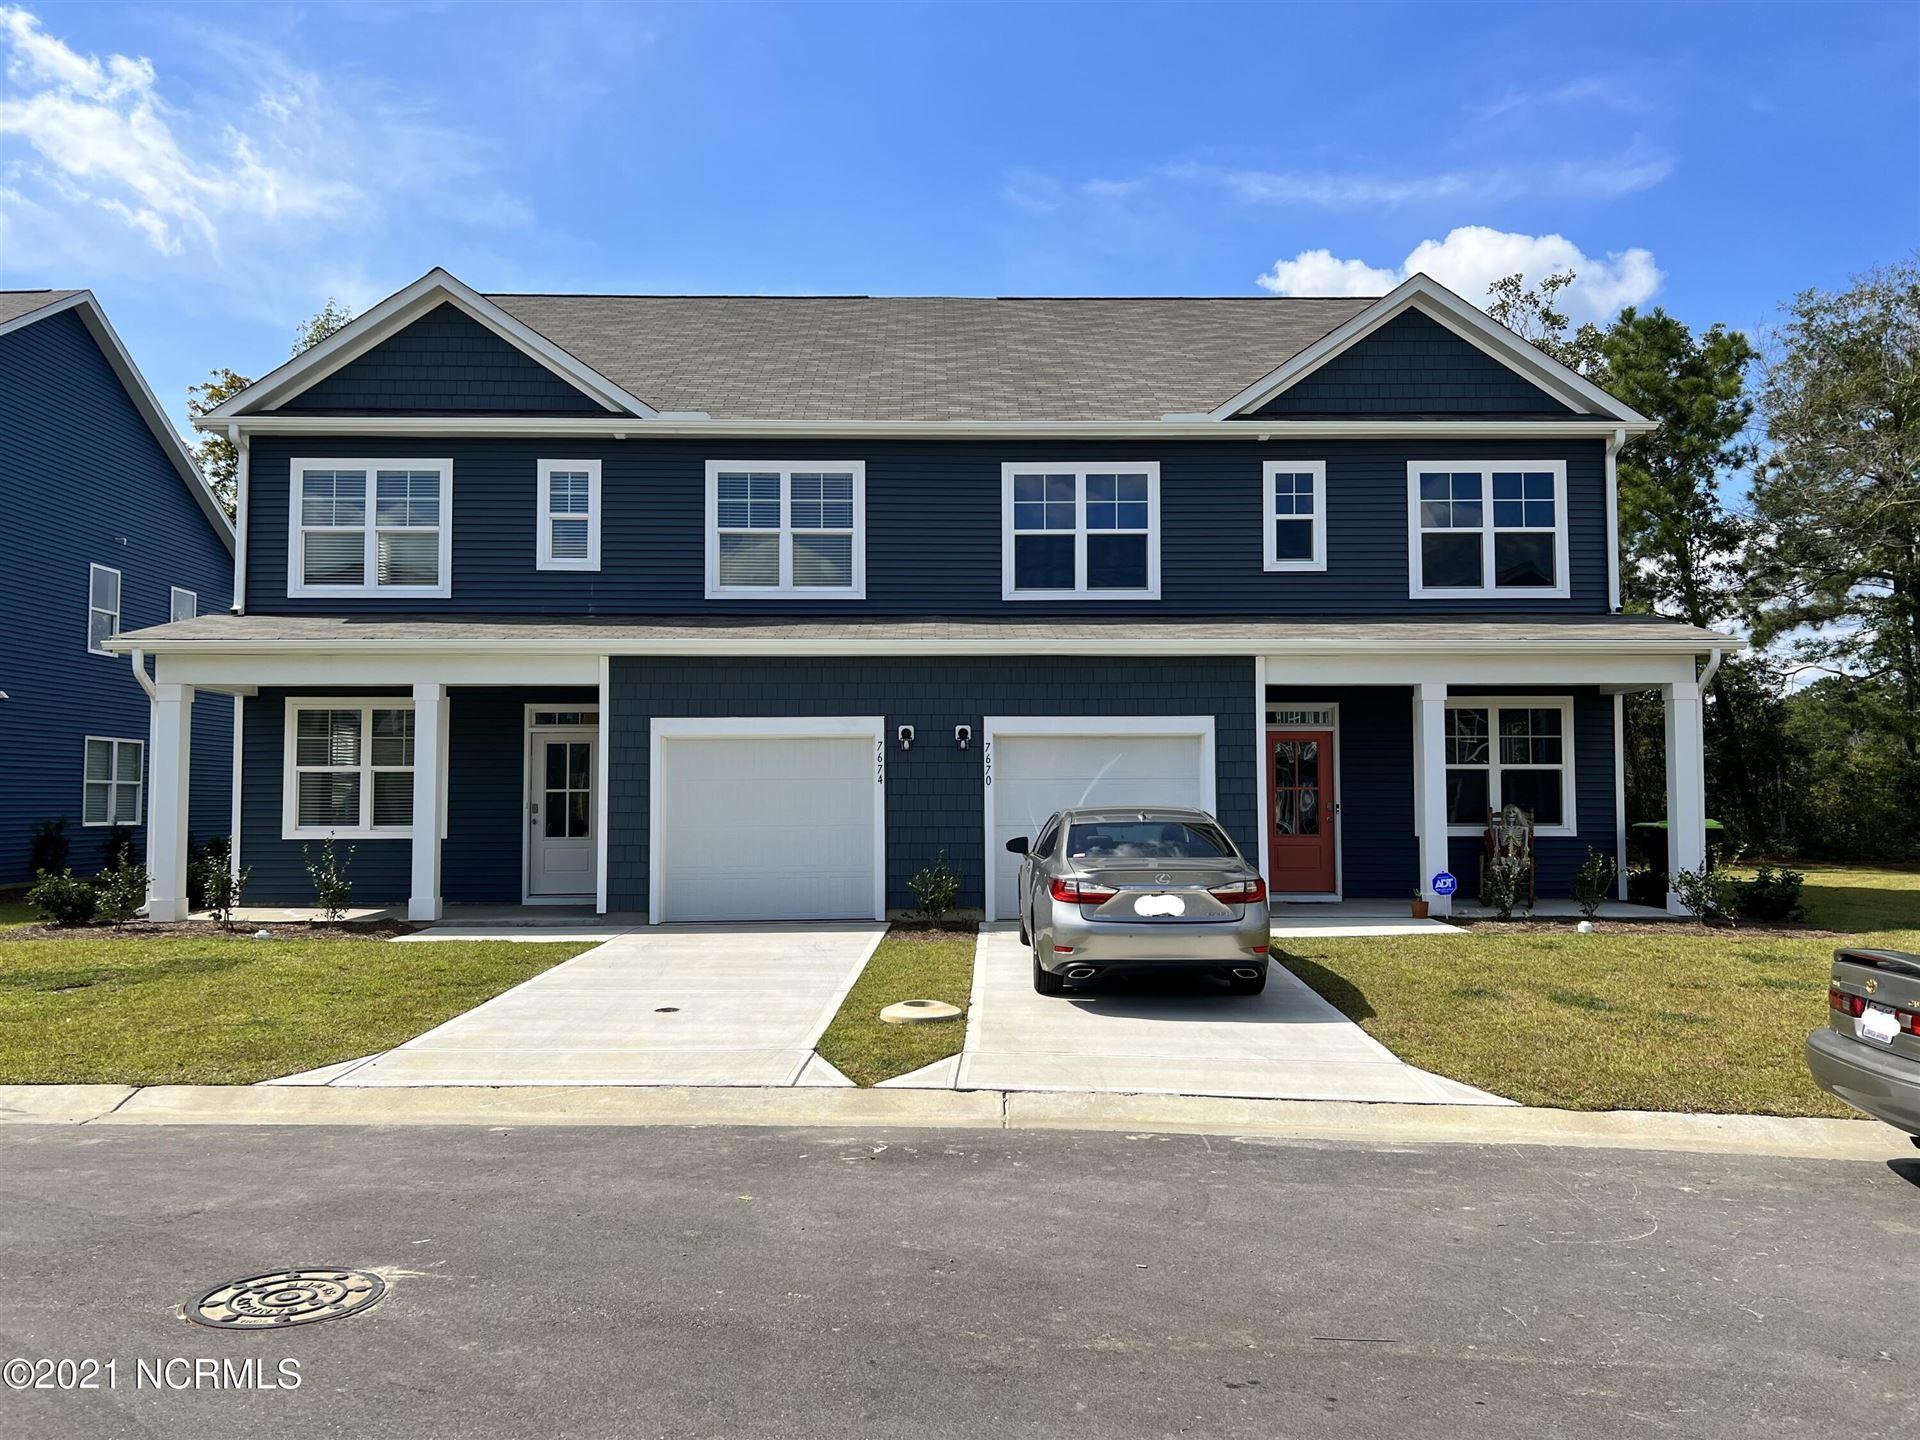 Photo of 4679 Wildaire Lane #Lot 61, Leland, NC 28451 (MLS # 100293292)